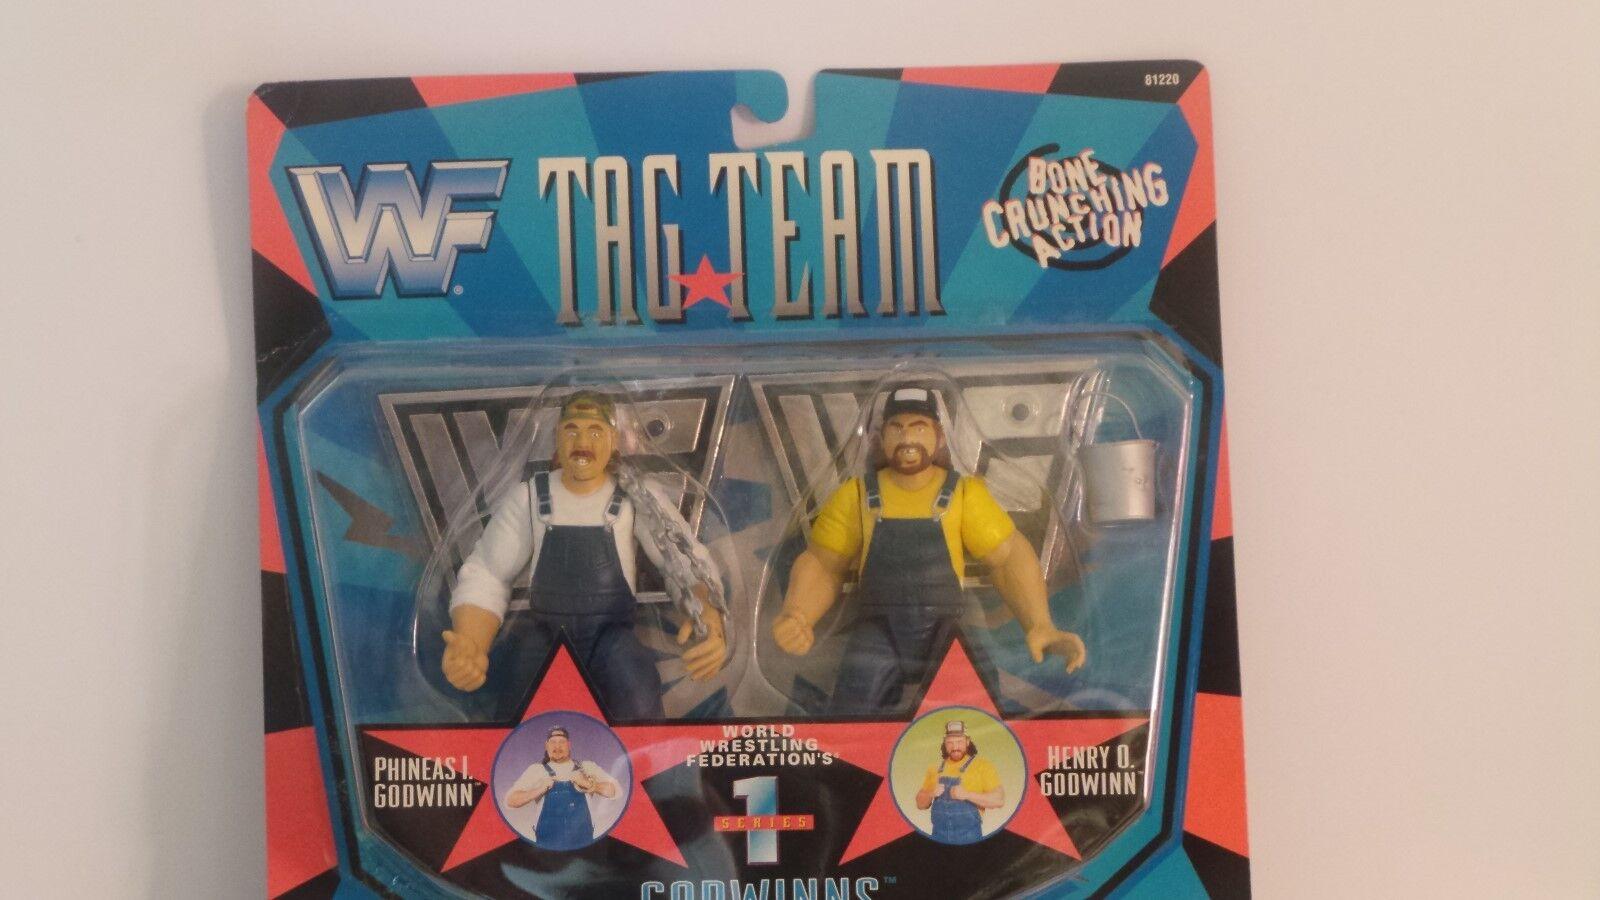 WWF TAG TEAM PHINEAS I GODWINN,HENRY O. GODWINN(006)